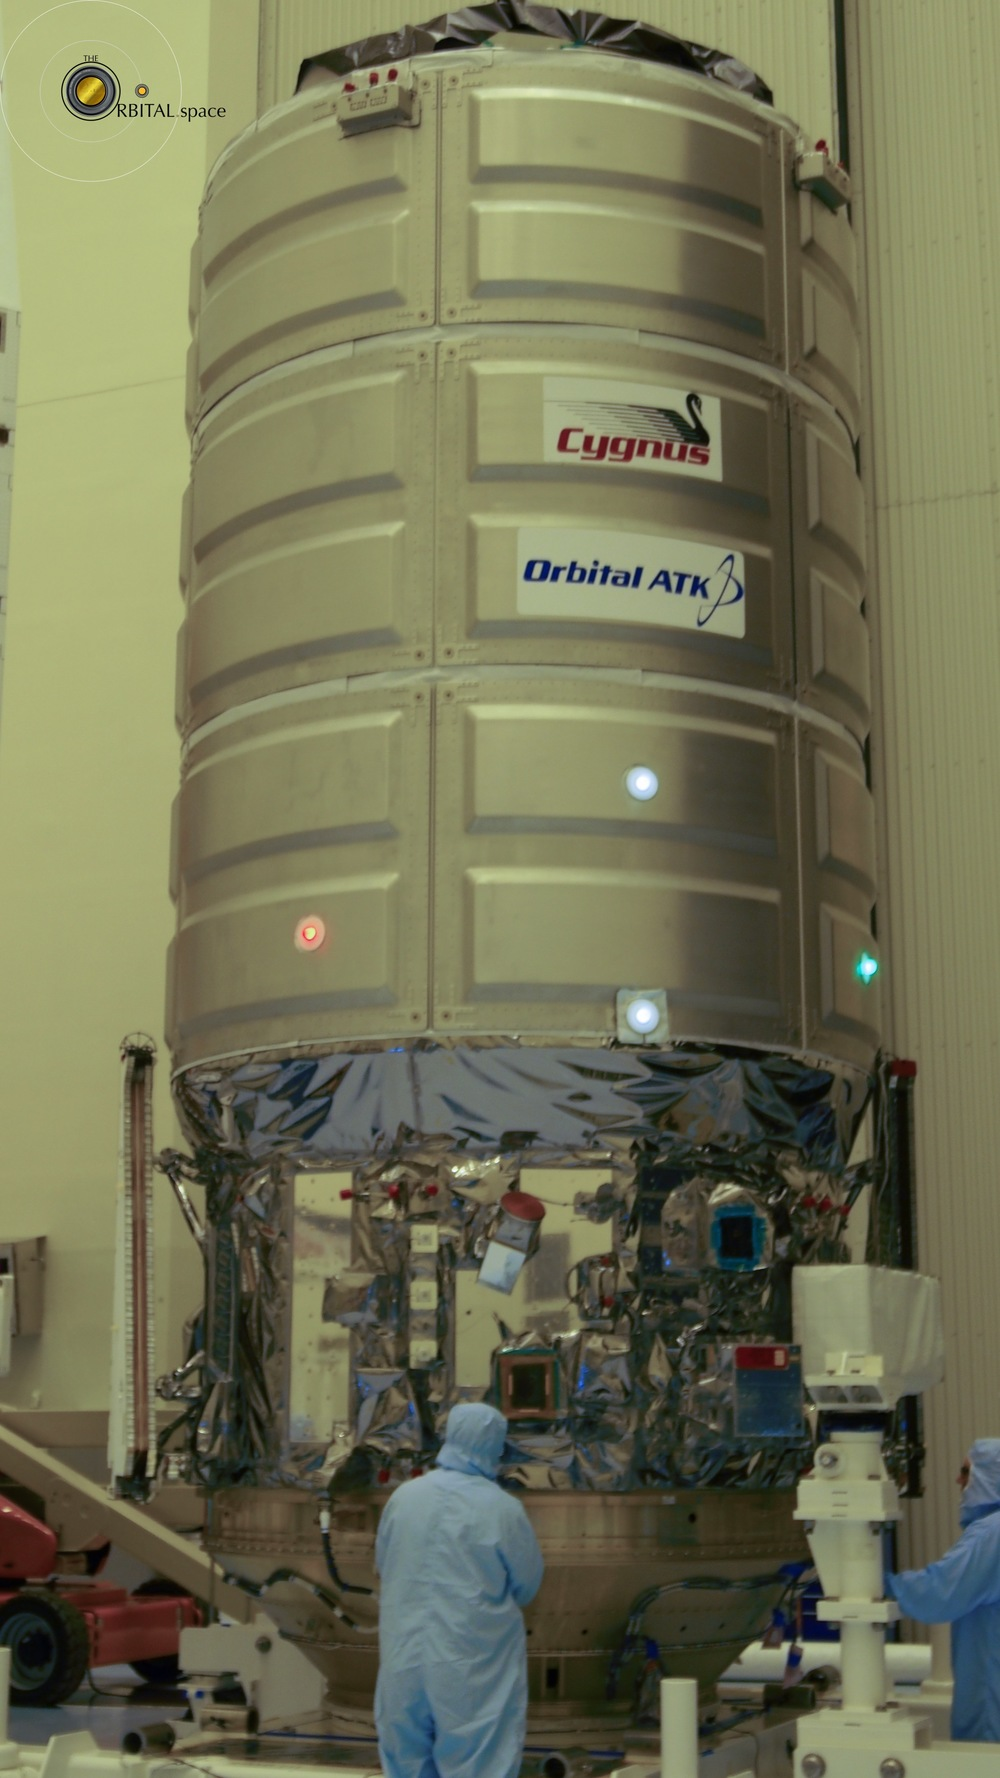 Working on Cygnus